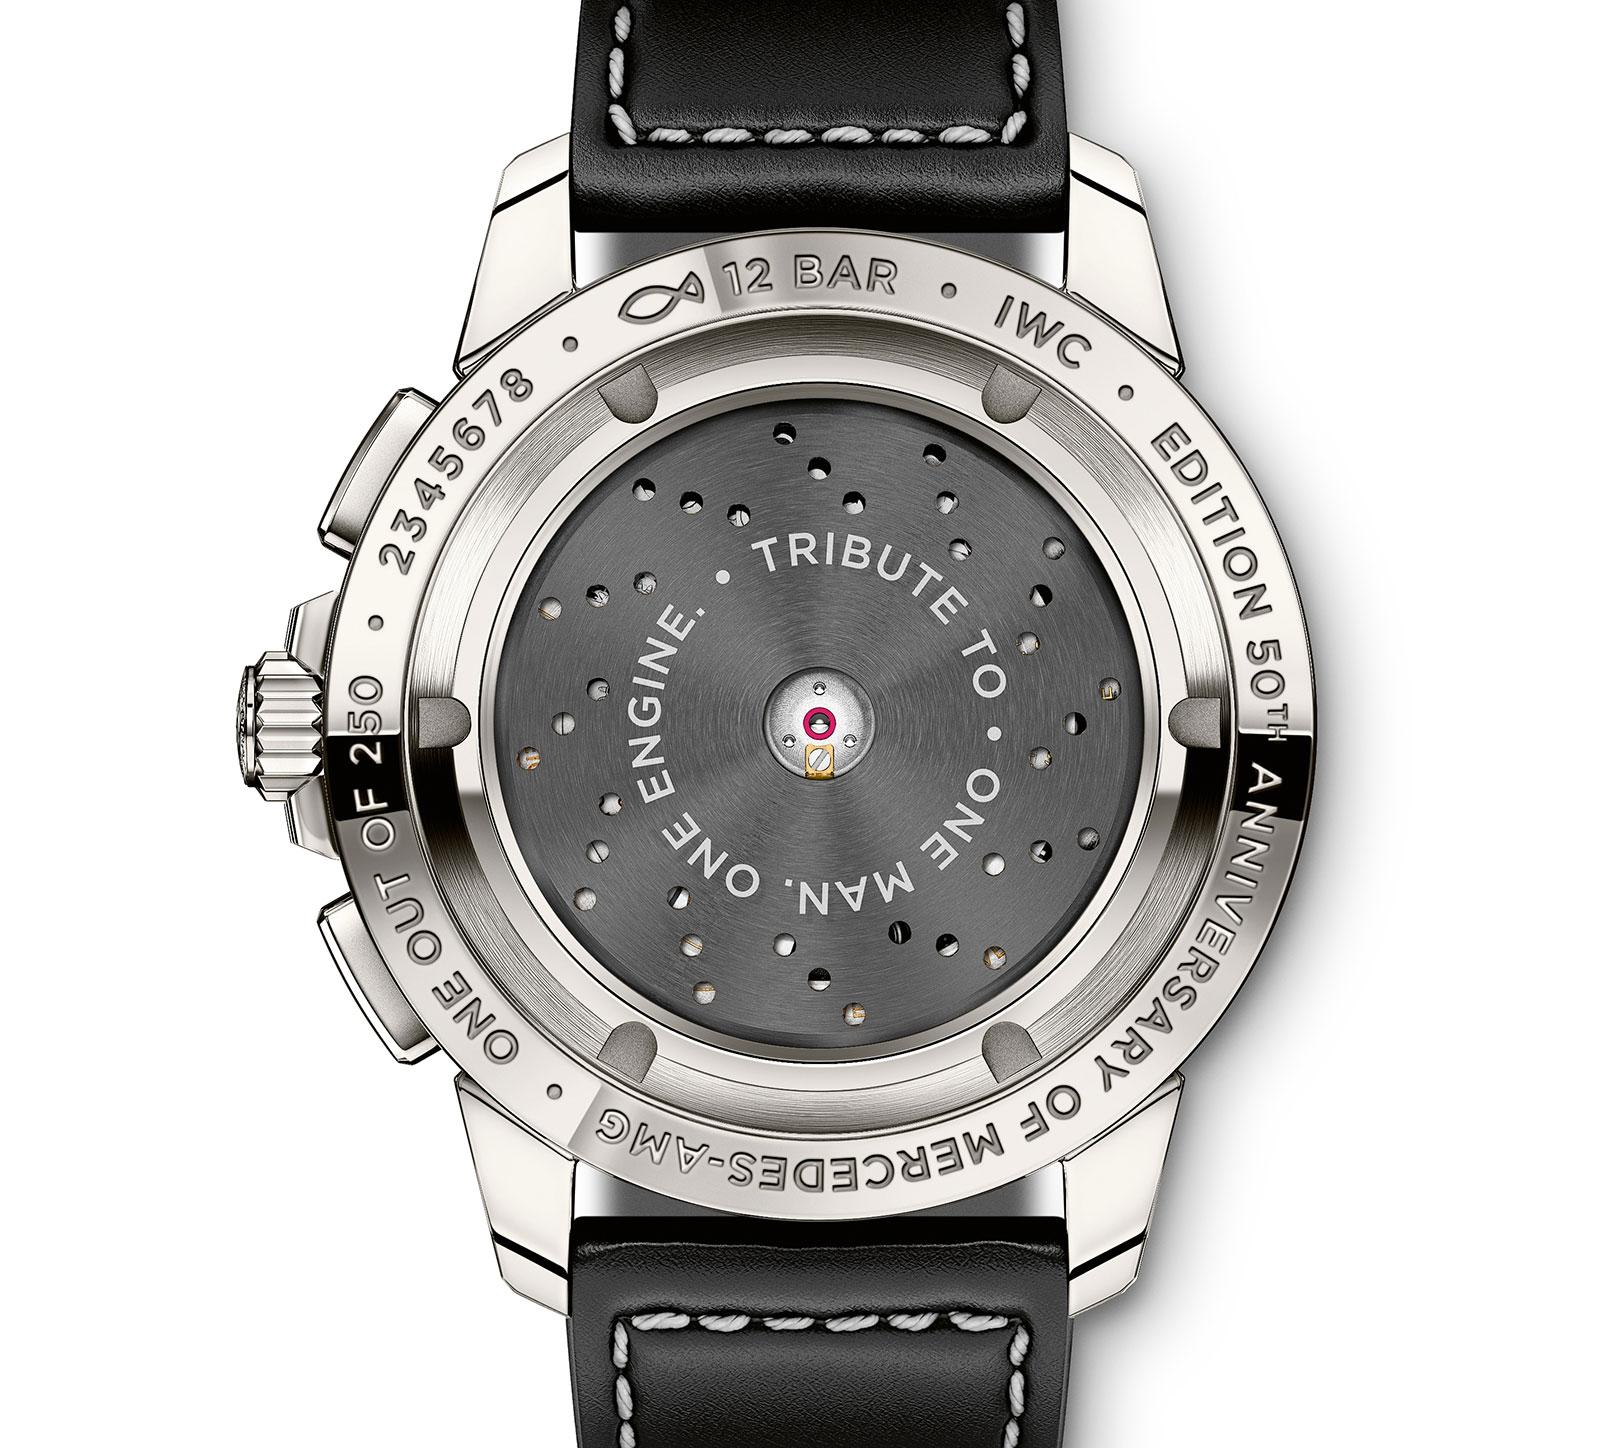 IWC Ingenieur Chronograph 50th Anniversary Mercedes-AMG 1